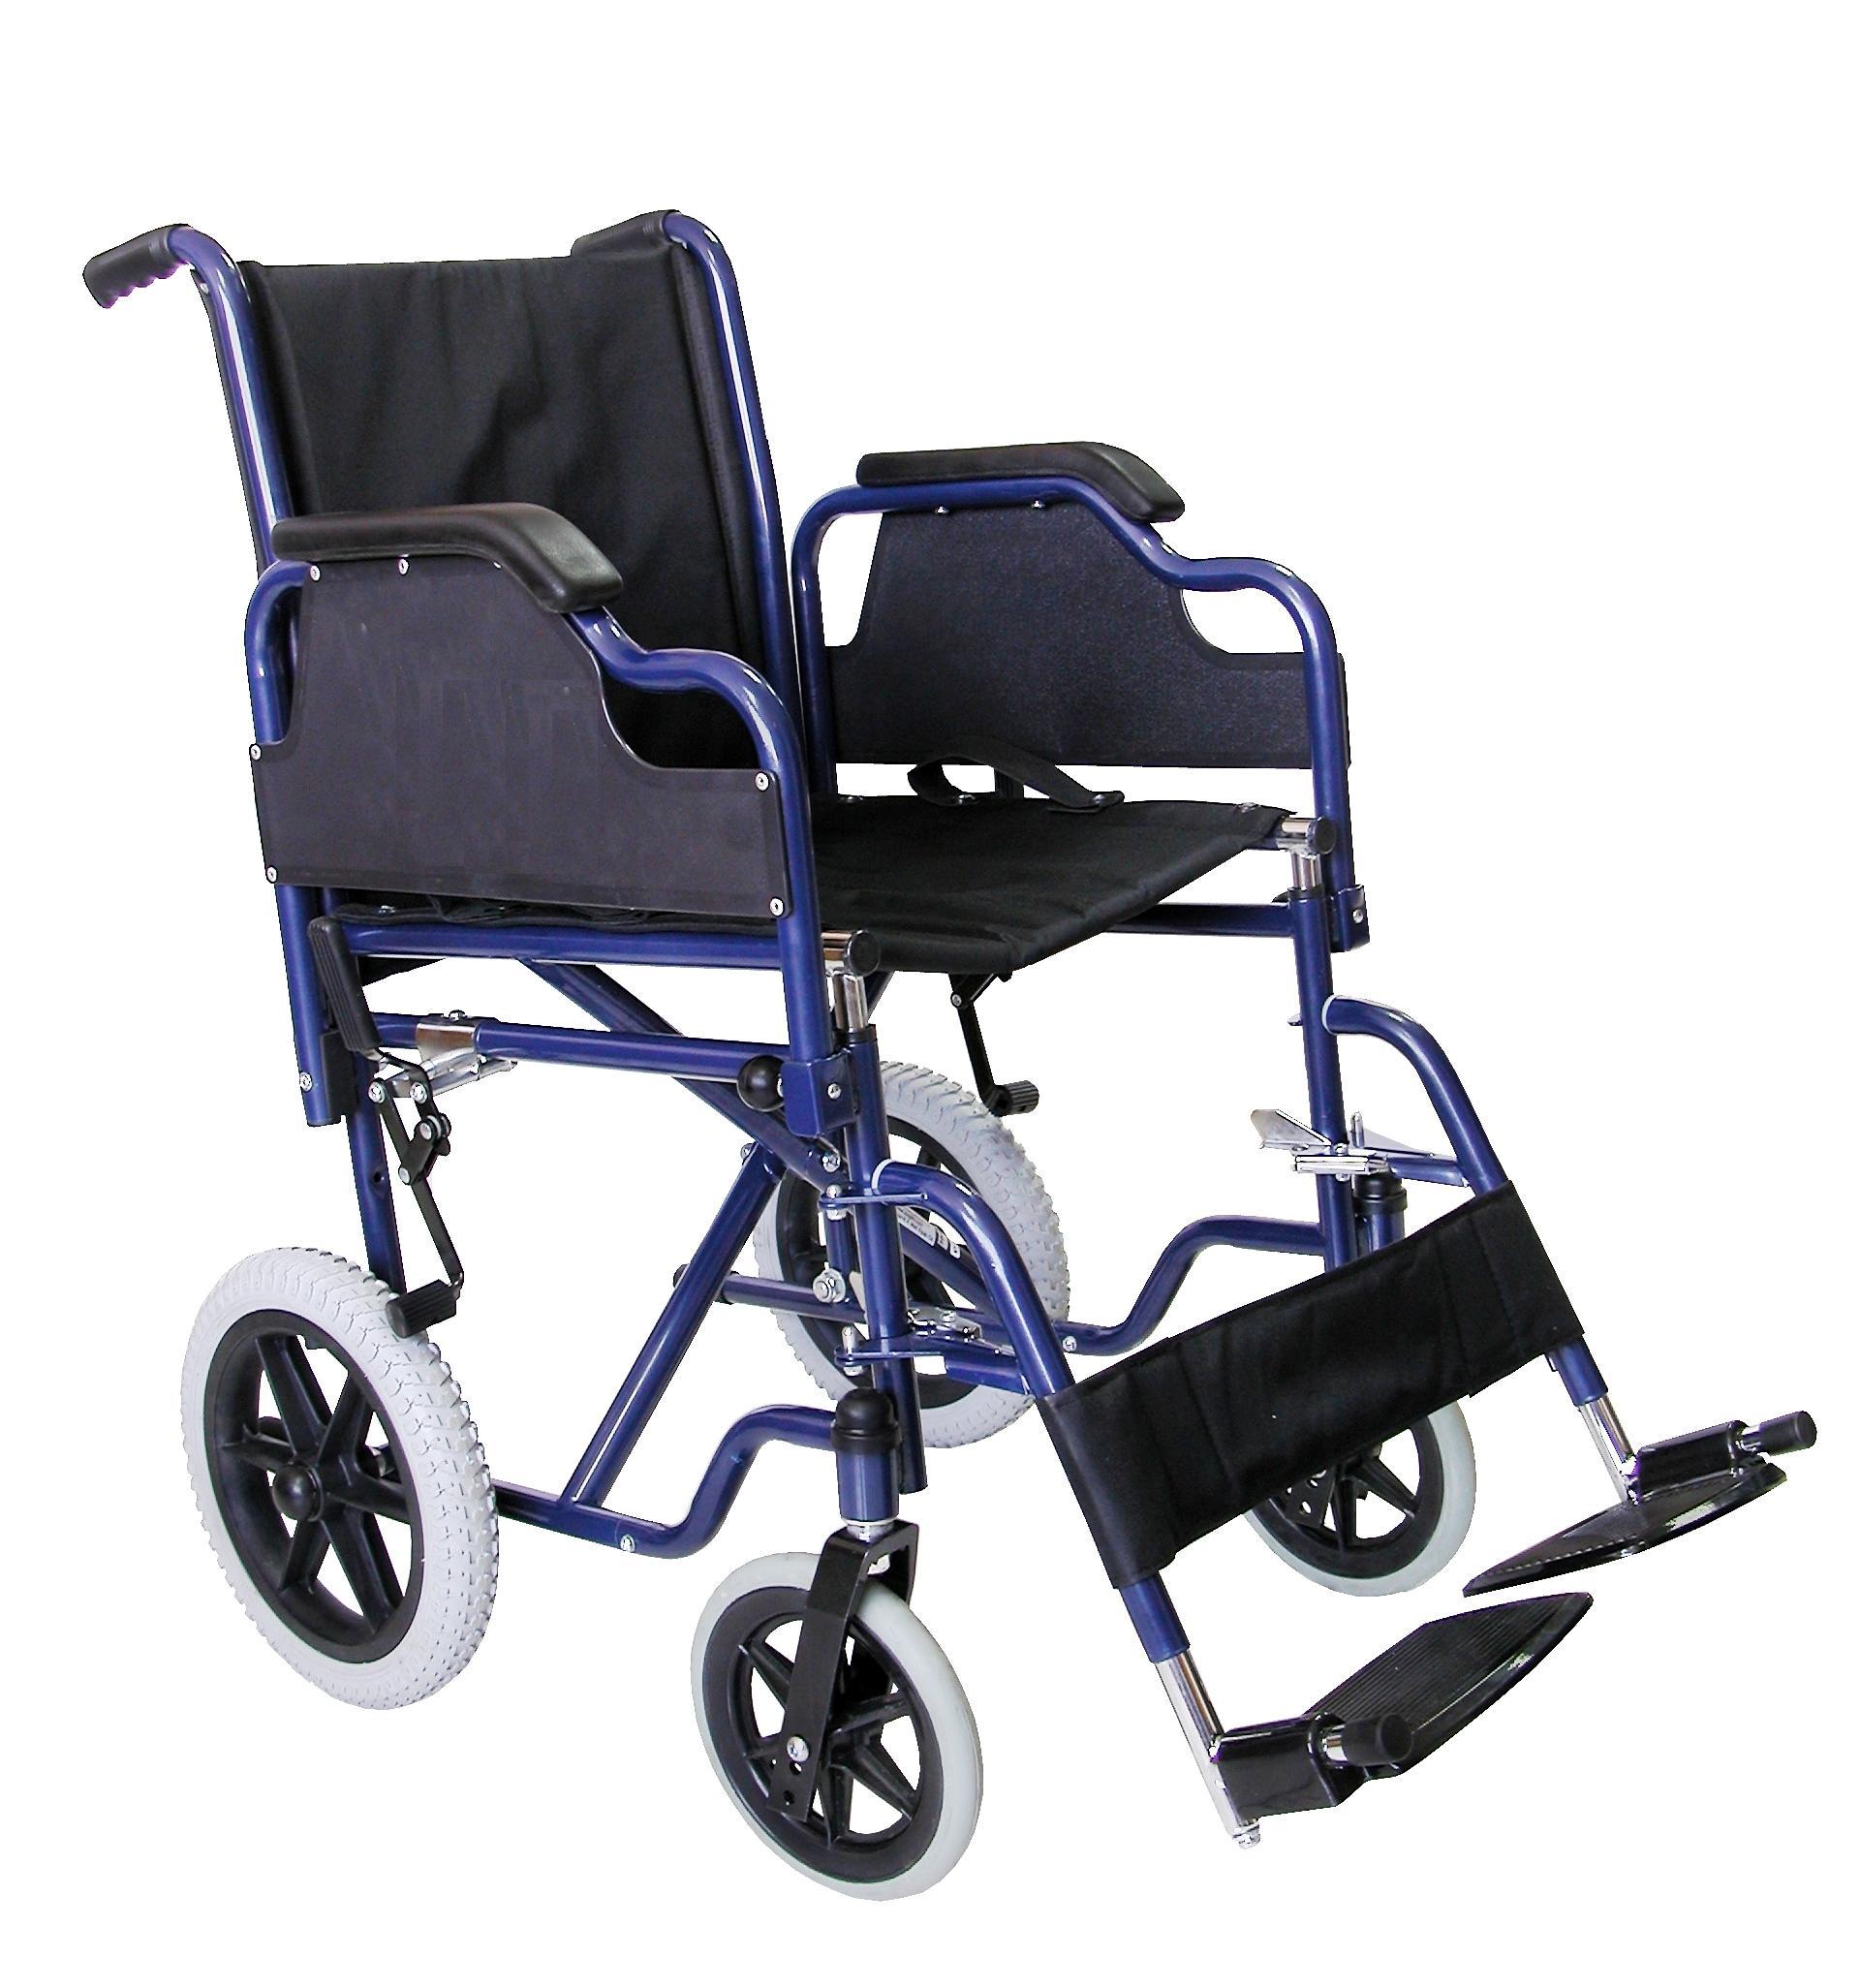 Silla de ruedas manual plegable de acero alta resistencia - Silla alta plegable ...